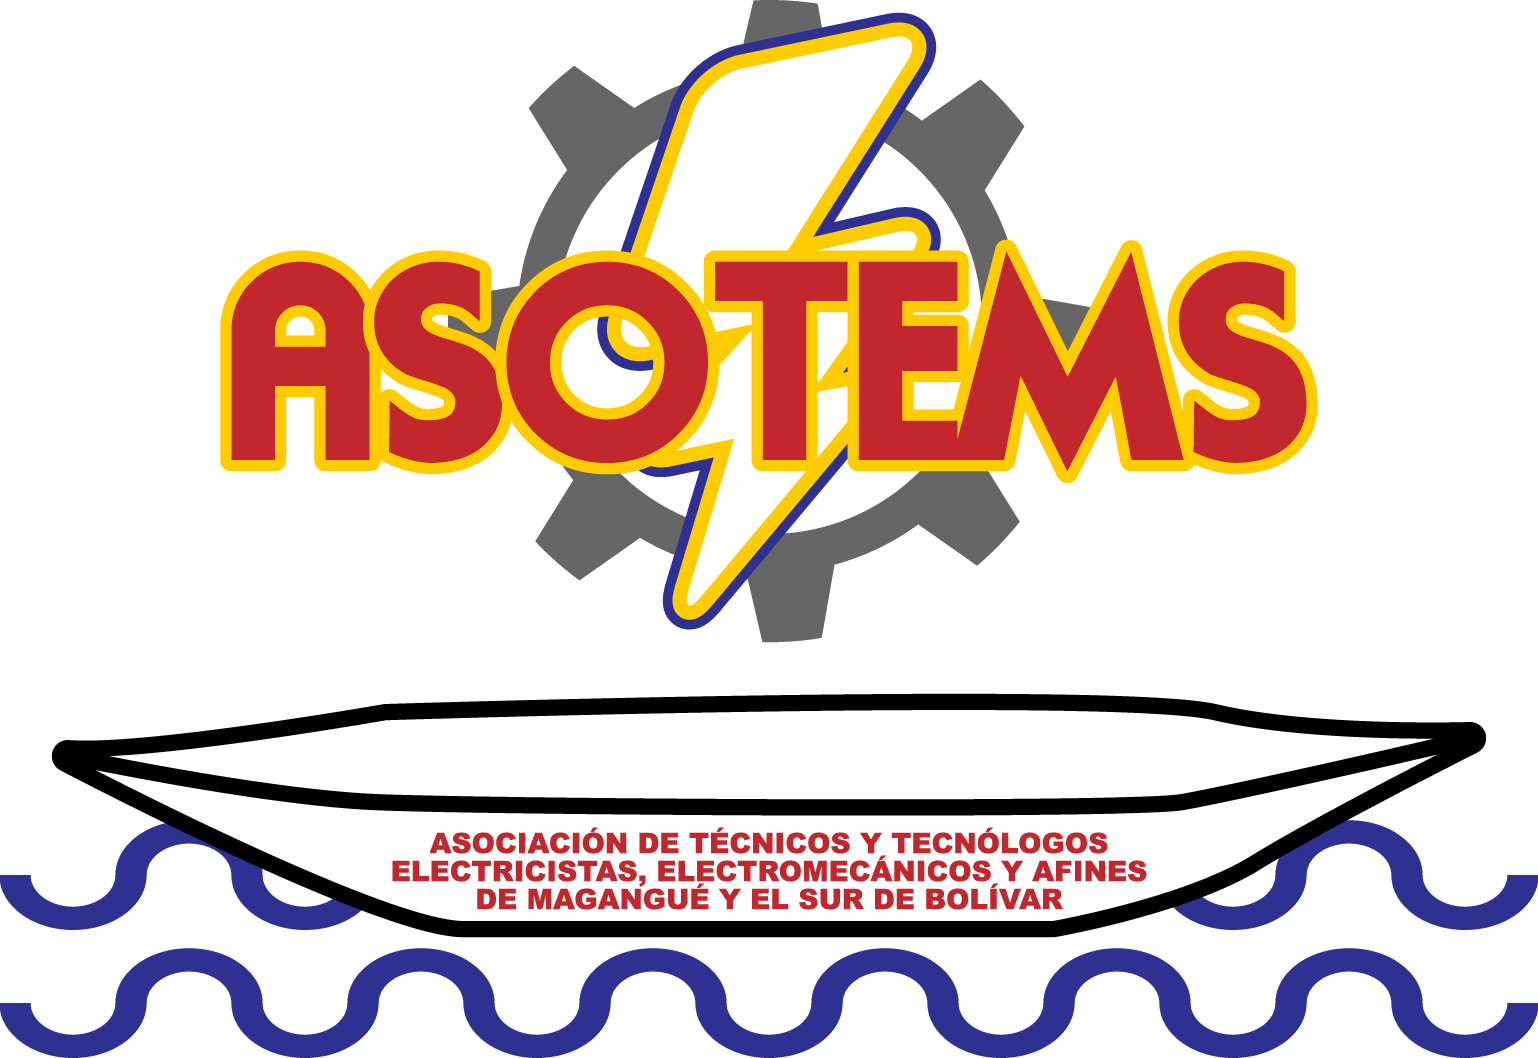 ASOTEMS logo